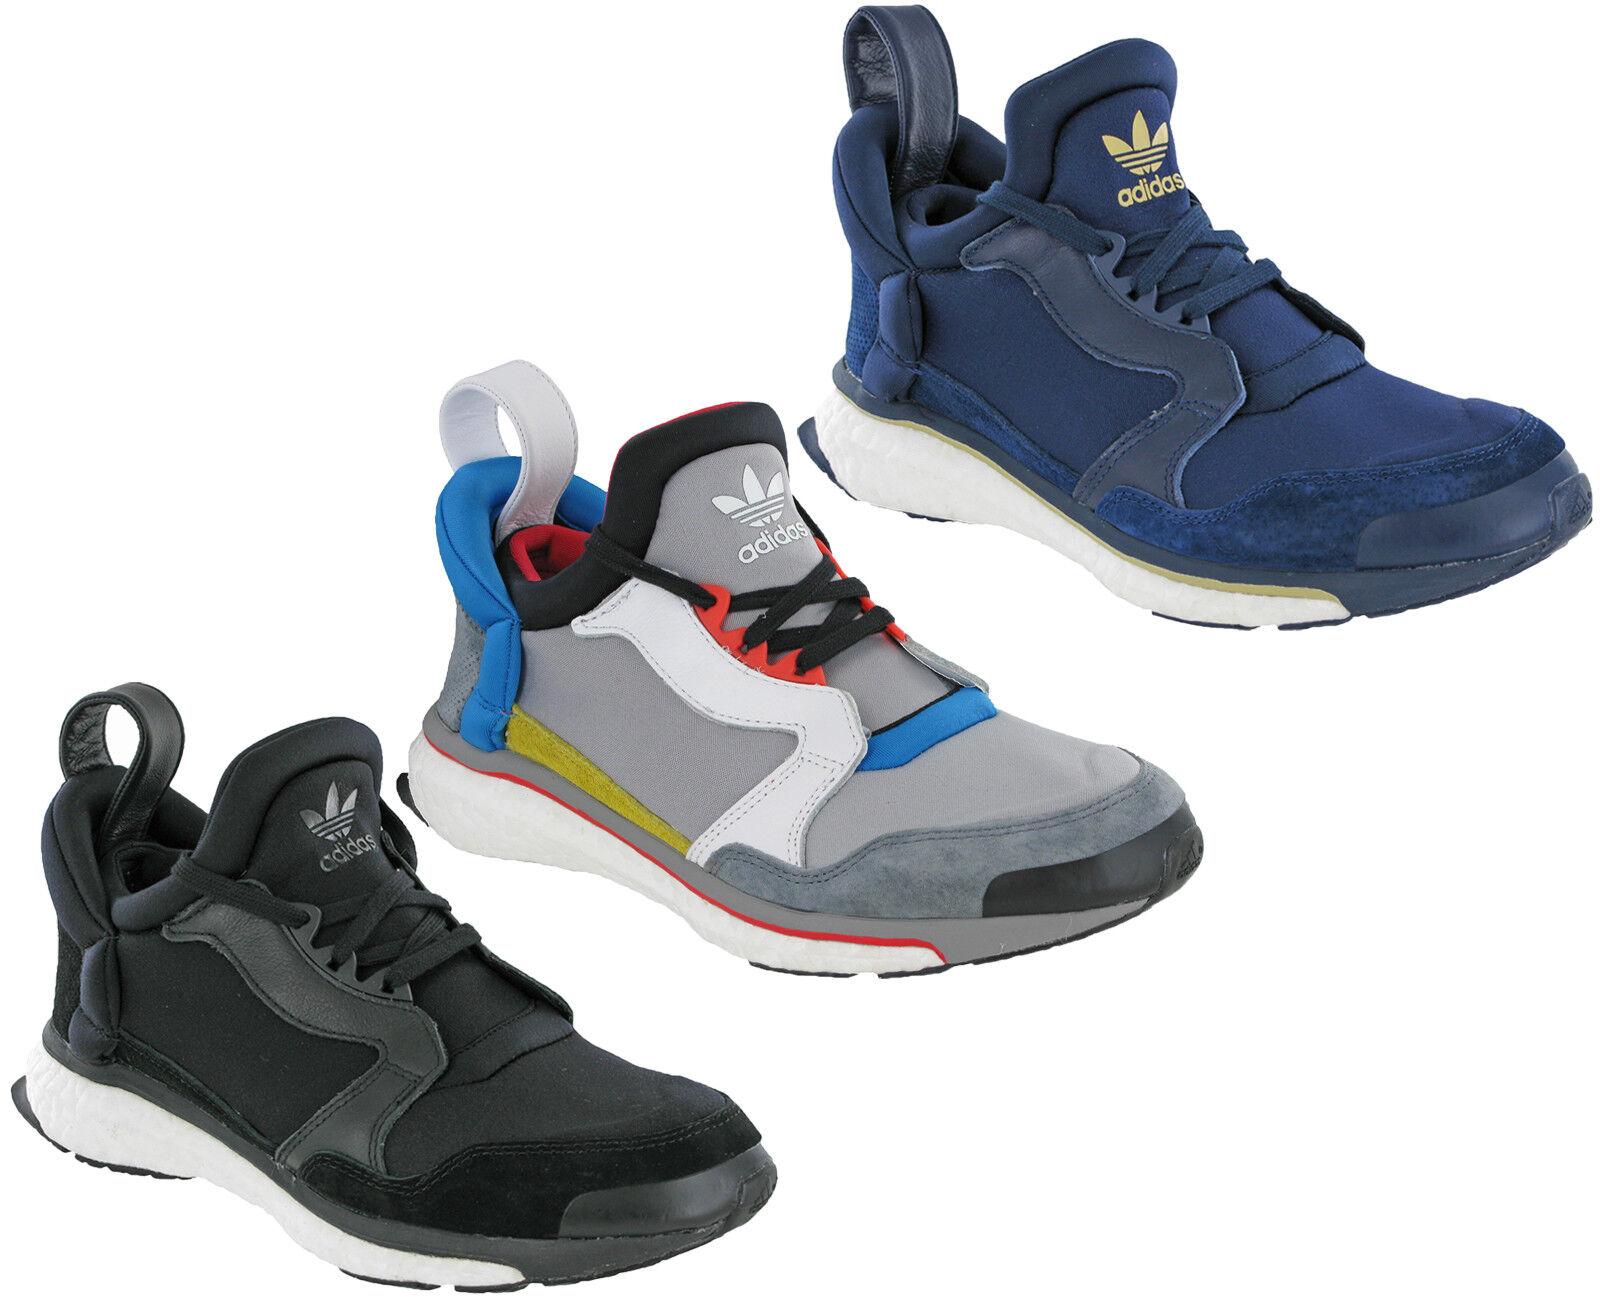 Adidas bluee Boost Trainers Running Cloudfoam Lightweight Mens Sports